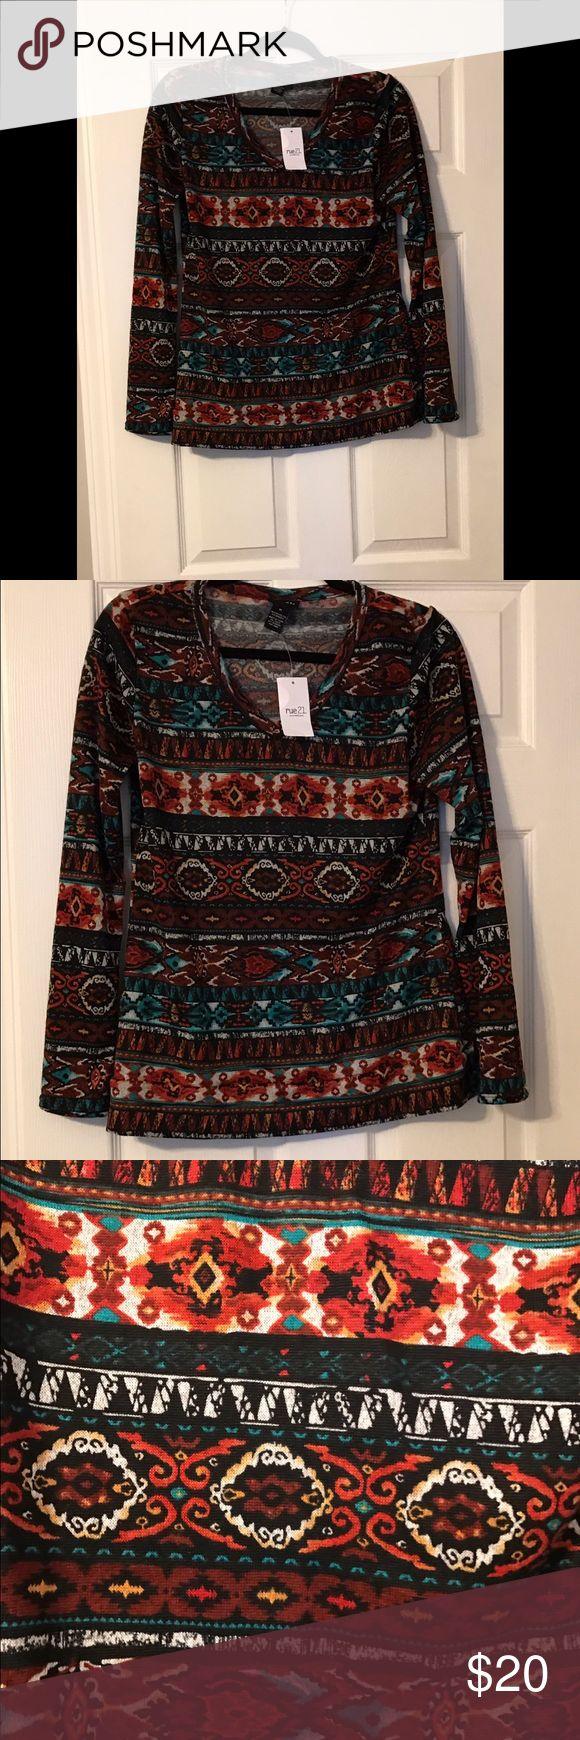 Final price!! NWT Rue 21 tribal print sweater- XL NWT Rue 21 tribal print multi- color V neck sweater- XL Rue 21 Sweaters V-Necks